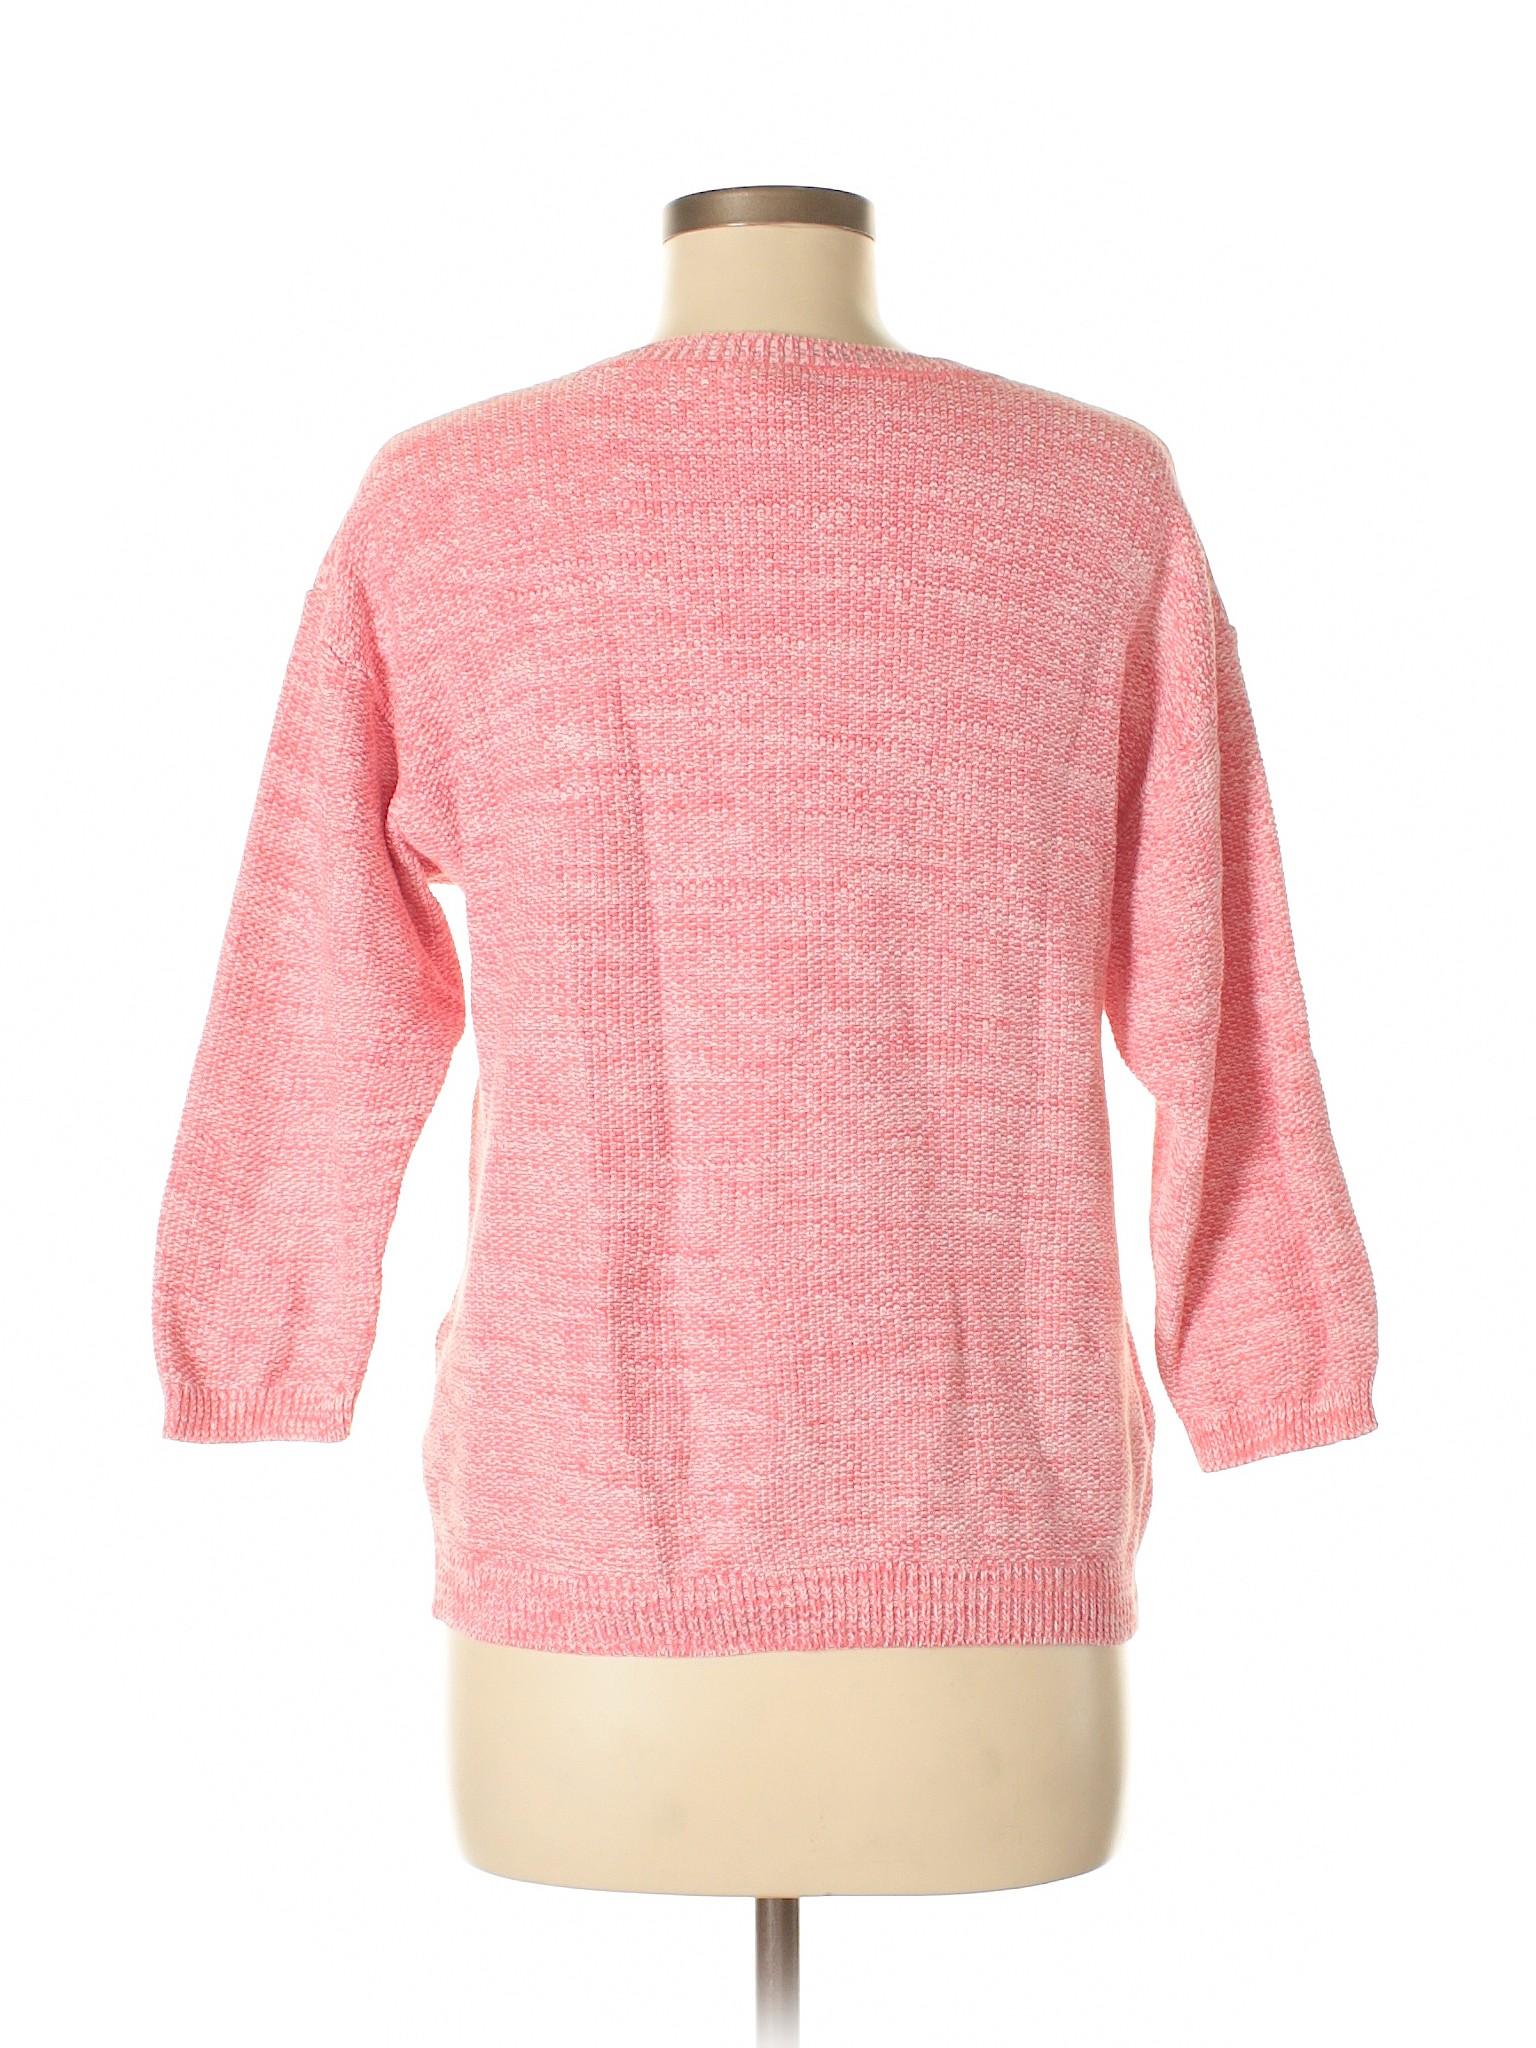 Factory Sweater Crew Boutique Pullover winter Store J wCx88t4qP